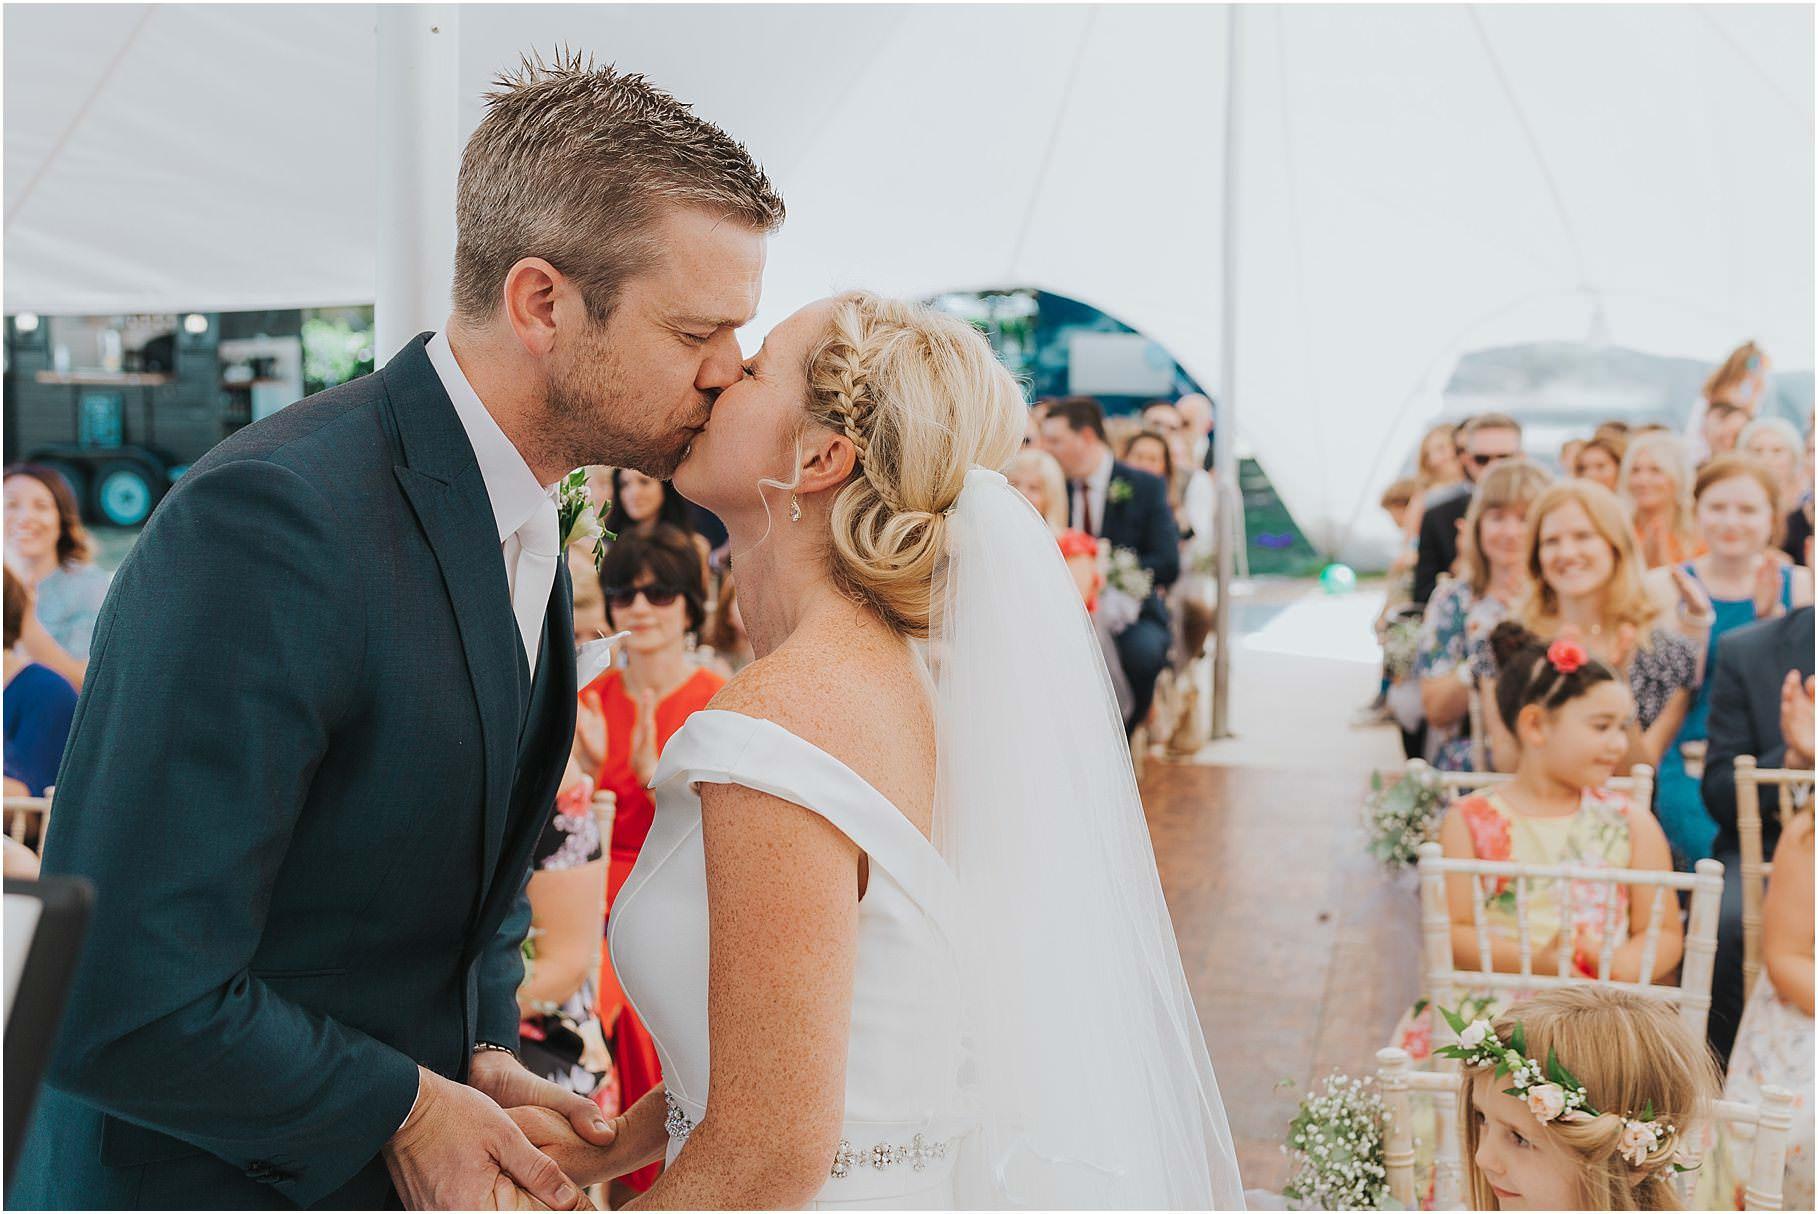 Cambridgeshire Wedding Photographer Black Horse Elton Wedding 1043 - Mr and Mrs Mac // CAMBRIDGESHIRE WEDDING